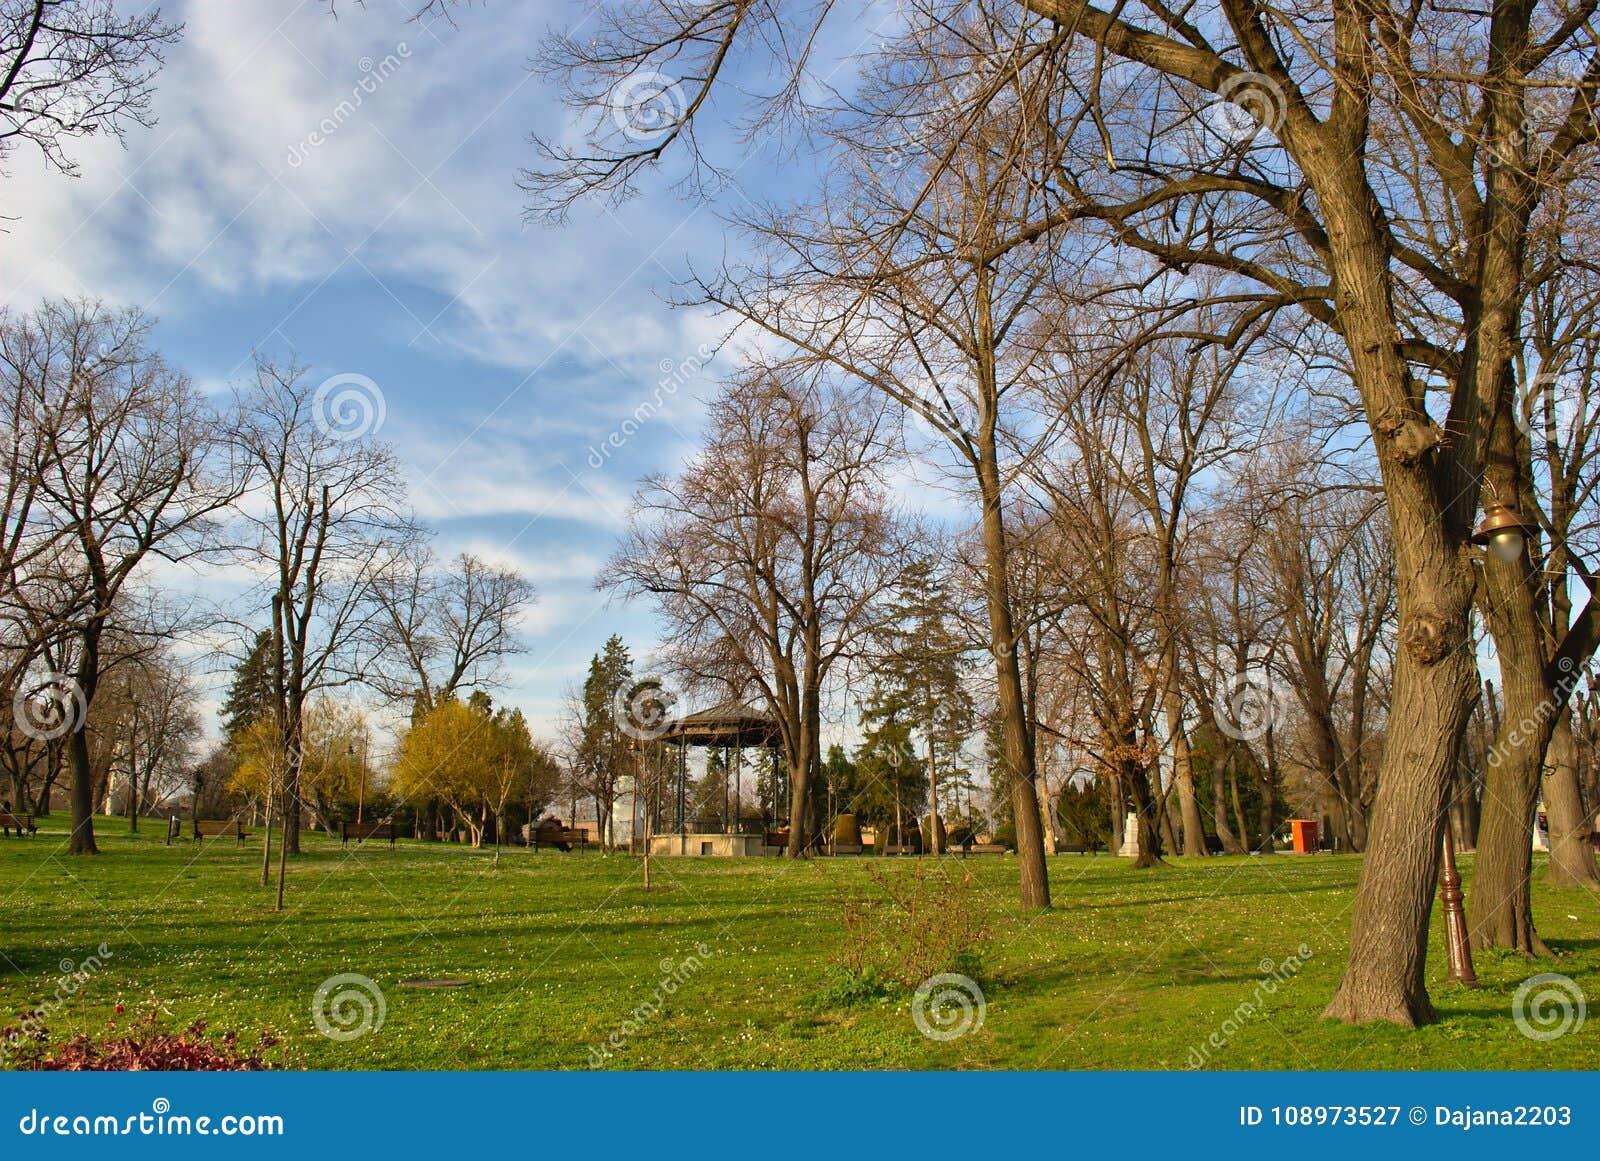 Kalemegdan, Belgrado, Serbia - una scena in molla in anticipo